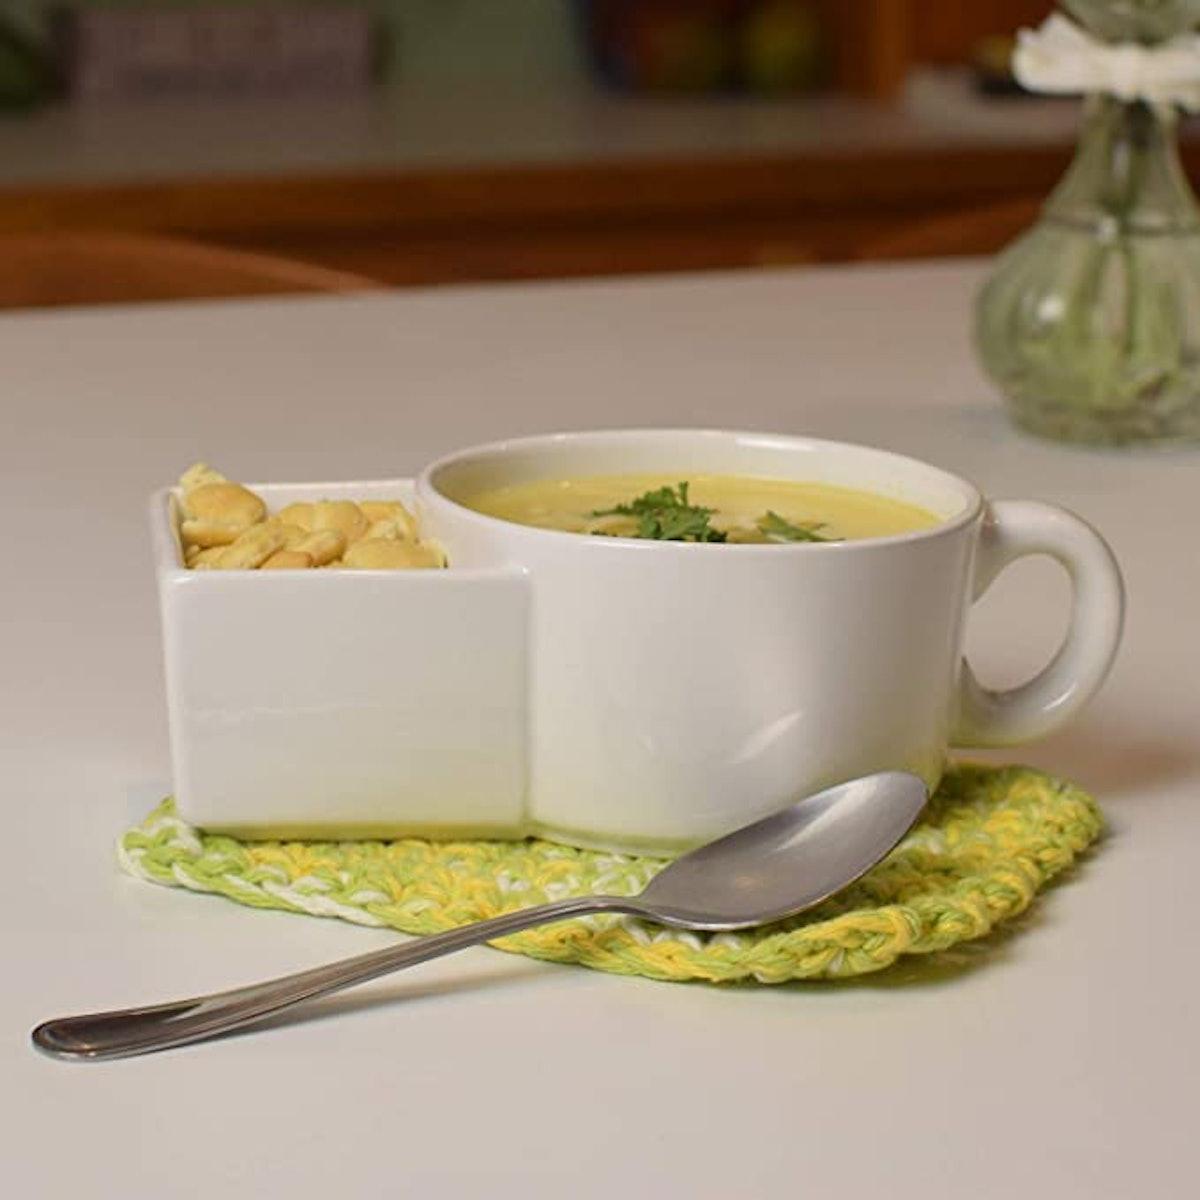 Kitchen Gadgets Soup and Cracker Mug or Cereal Bowl